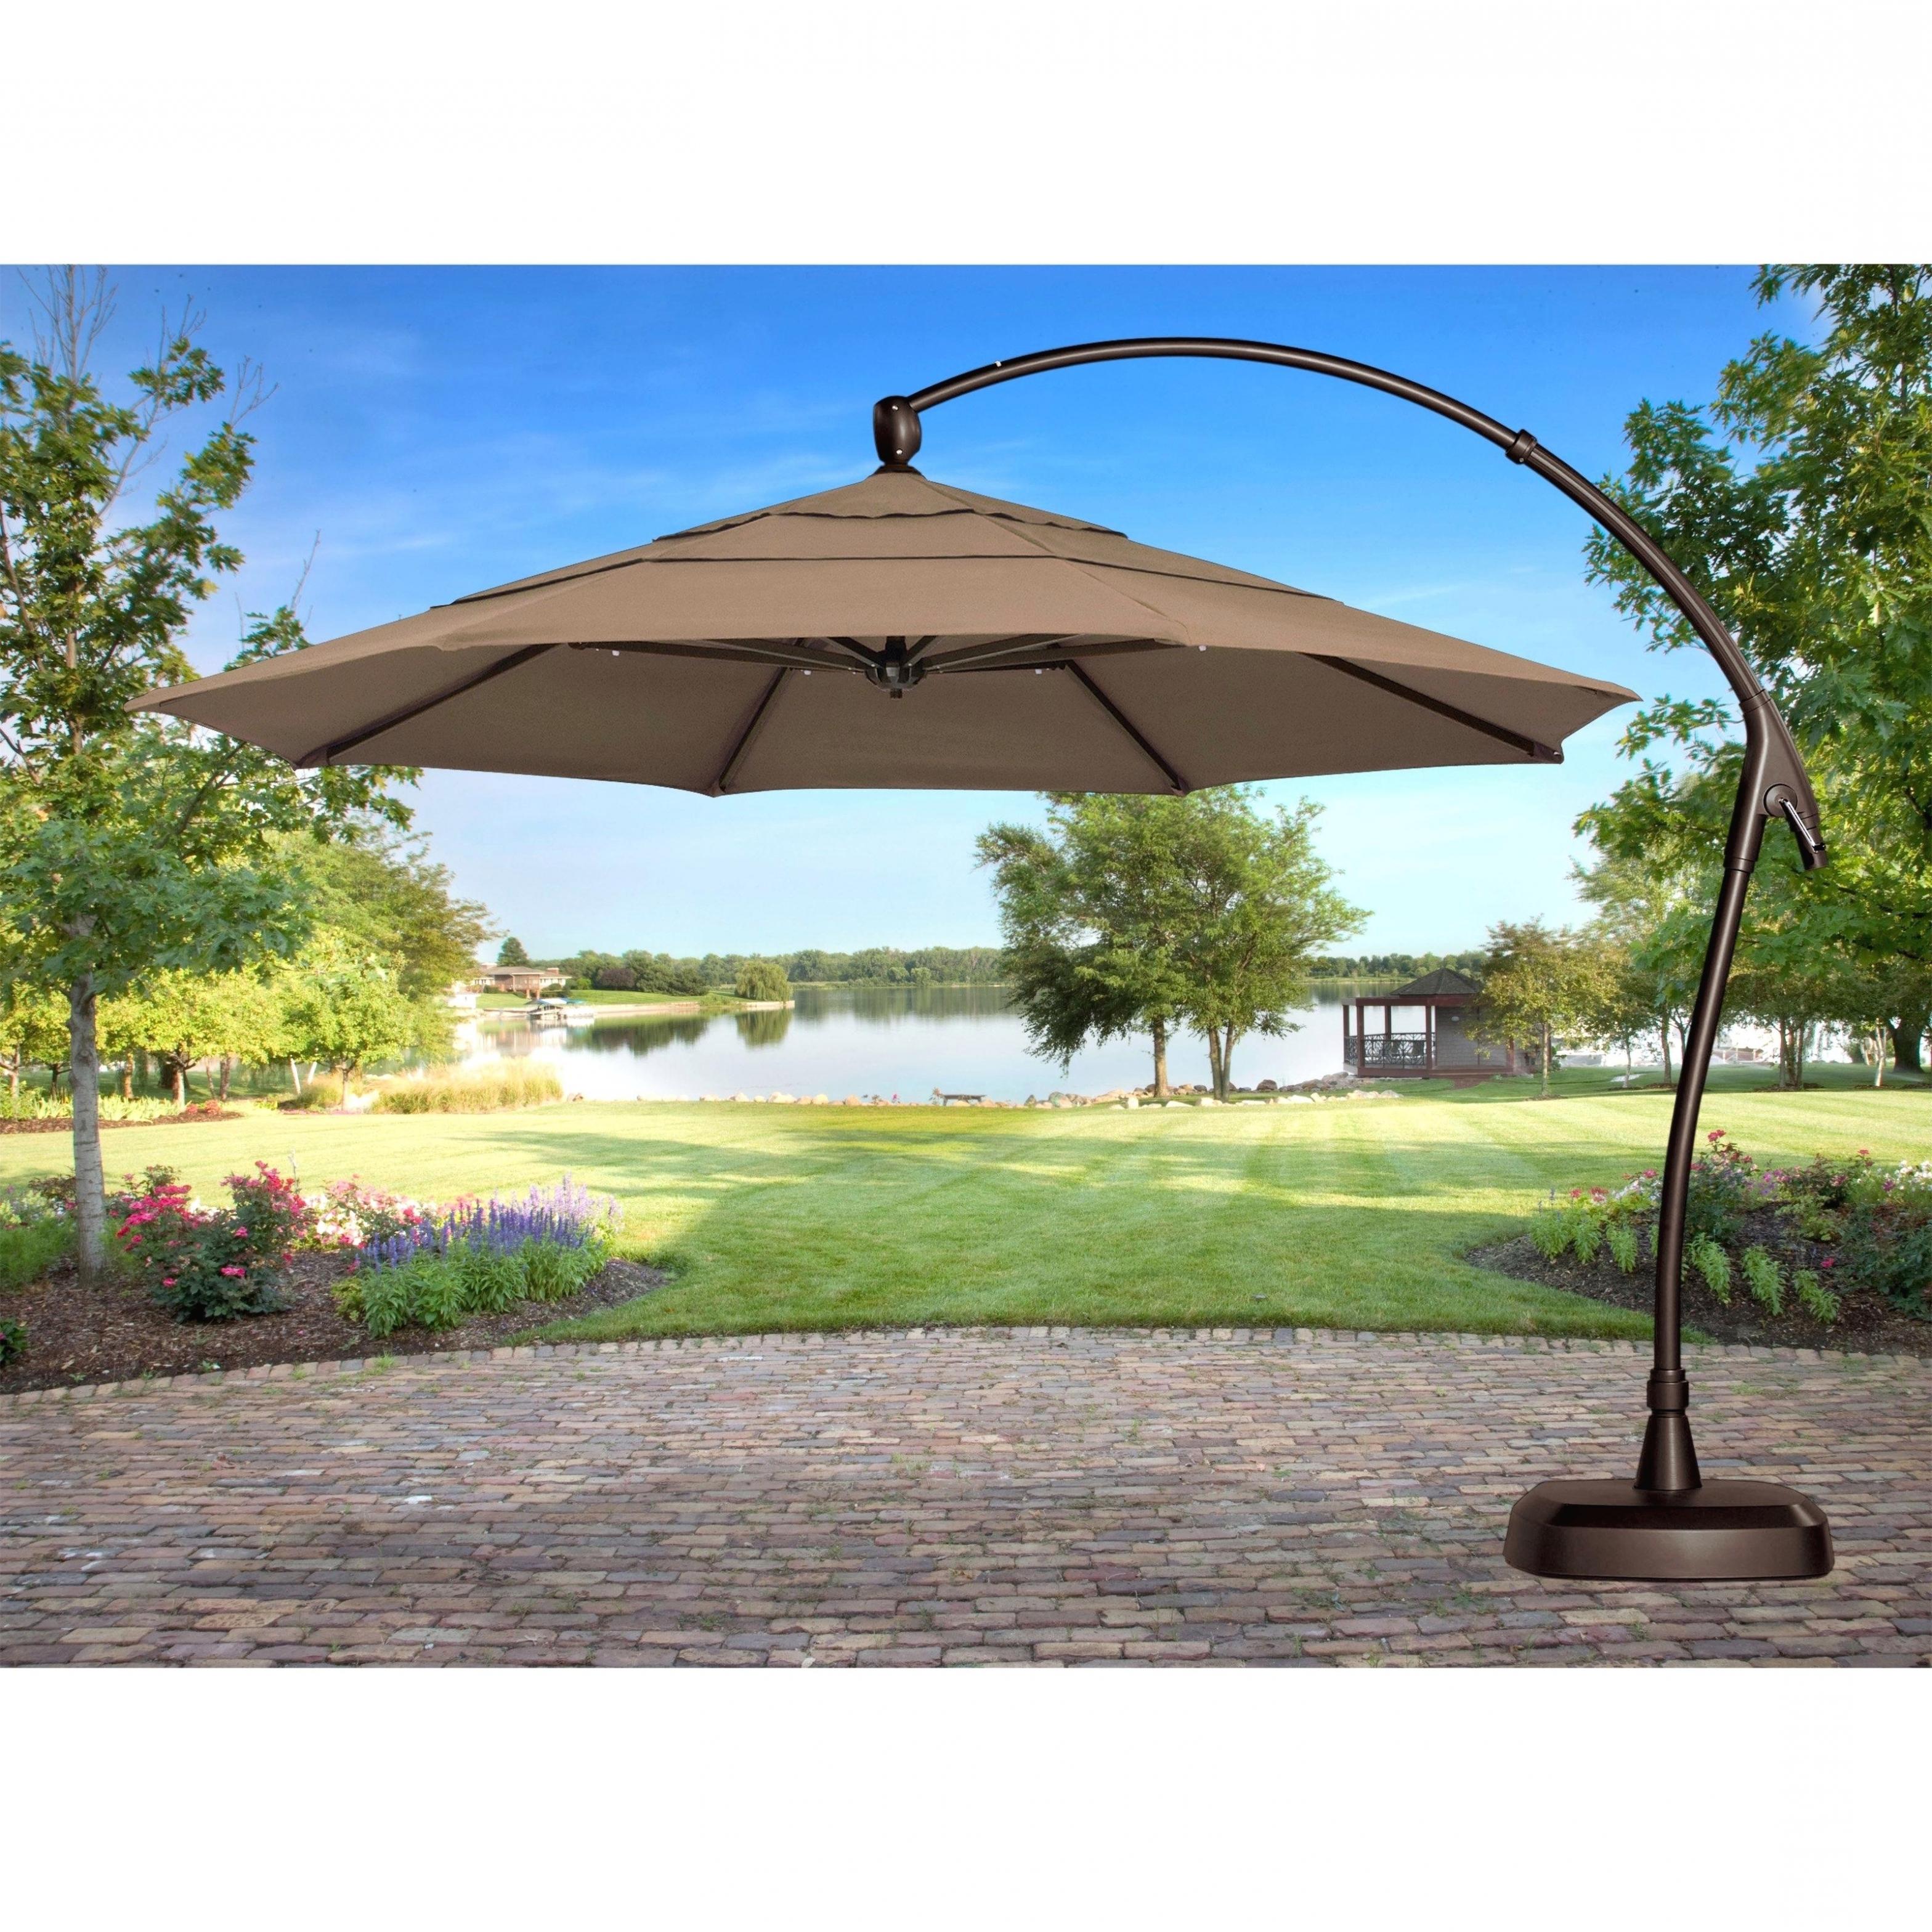 Interior Decor: Luxuriant Cantilever Patio Umbrella Teak Chairs With Favorite Sears Patio Umbrellas (View 5 of 20)